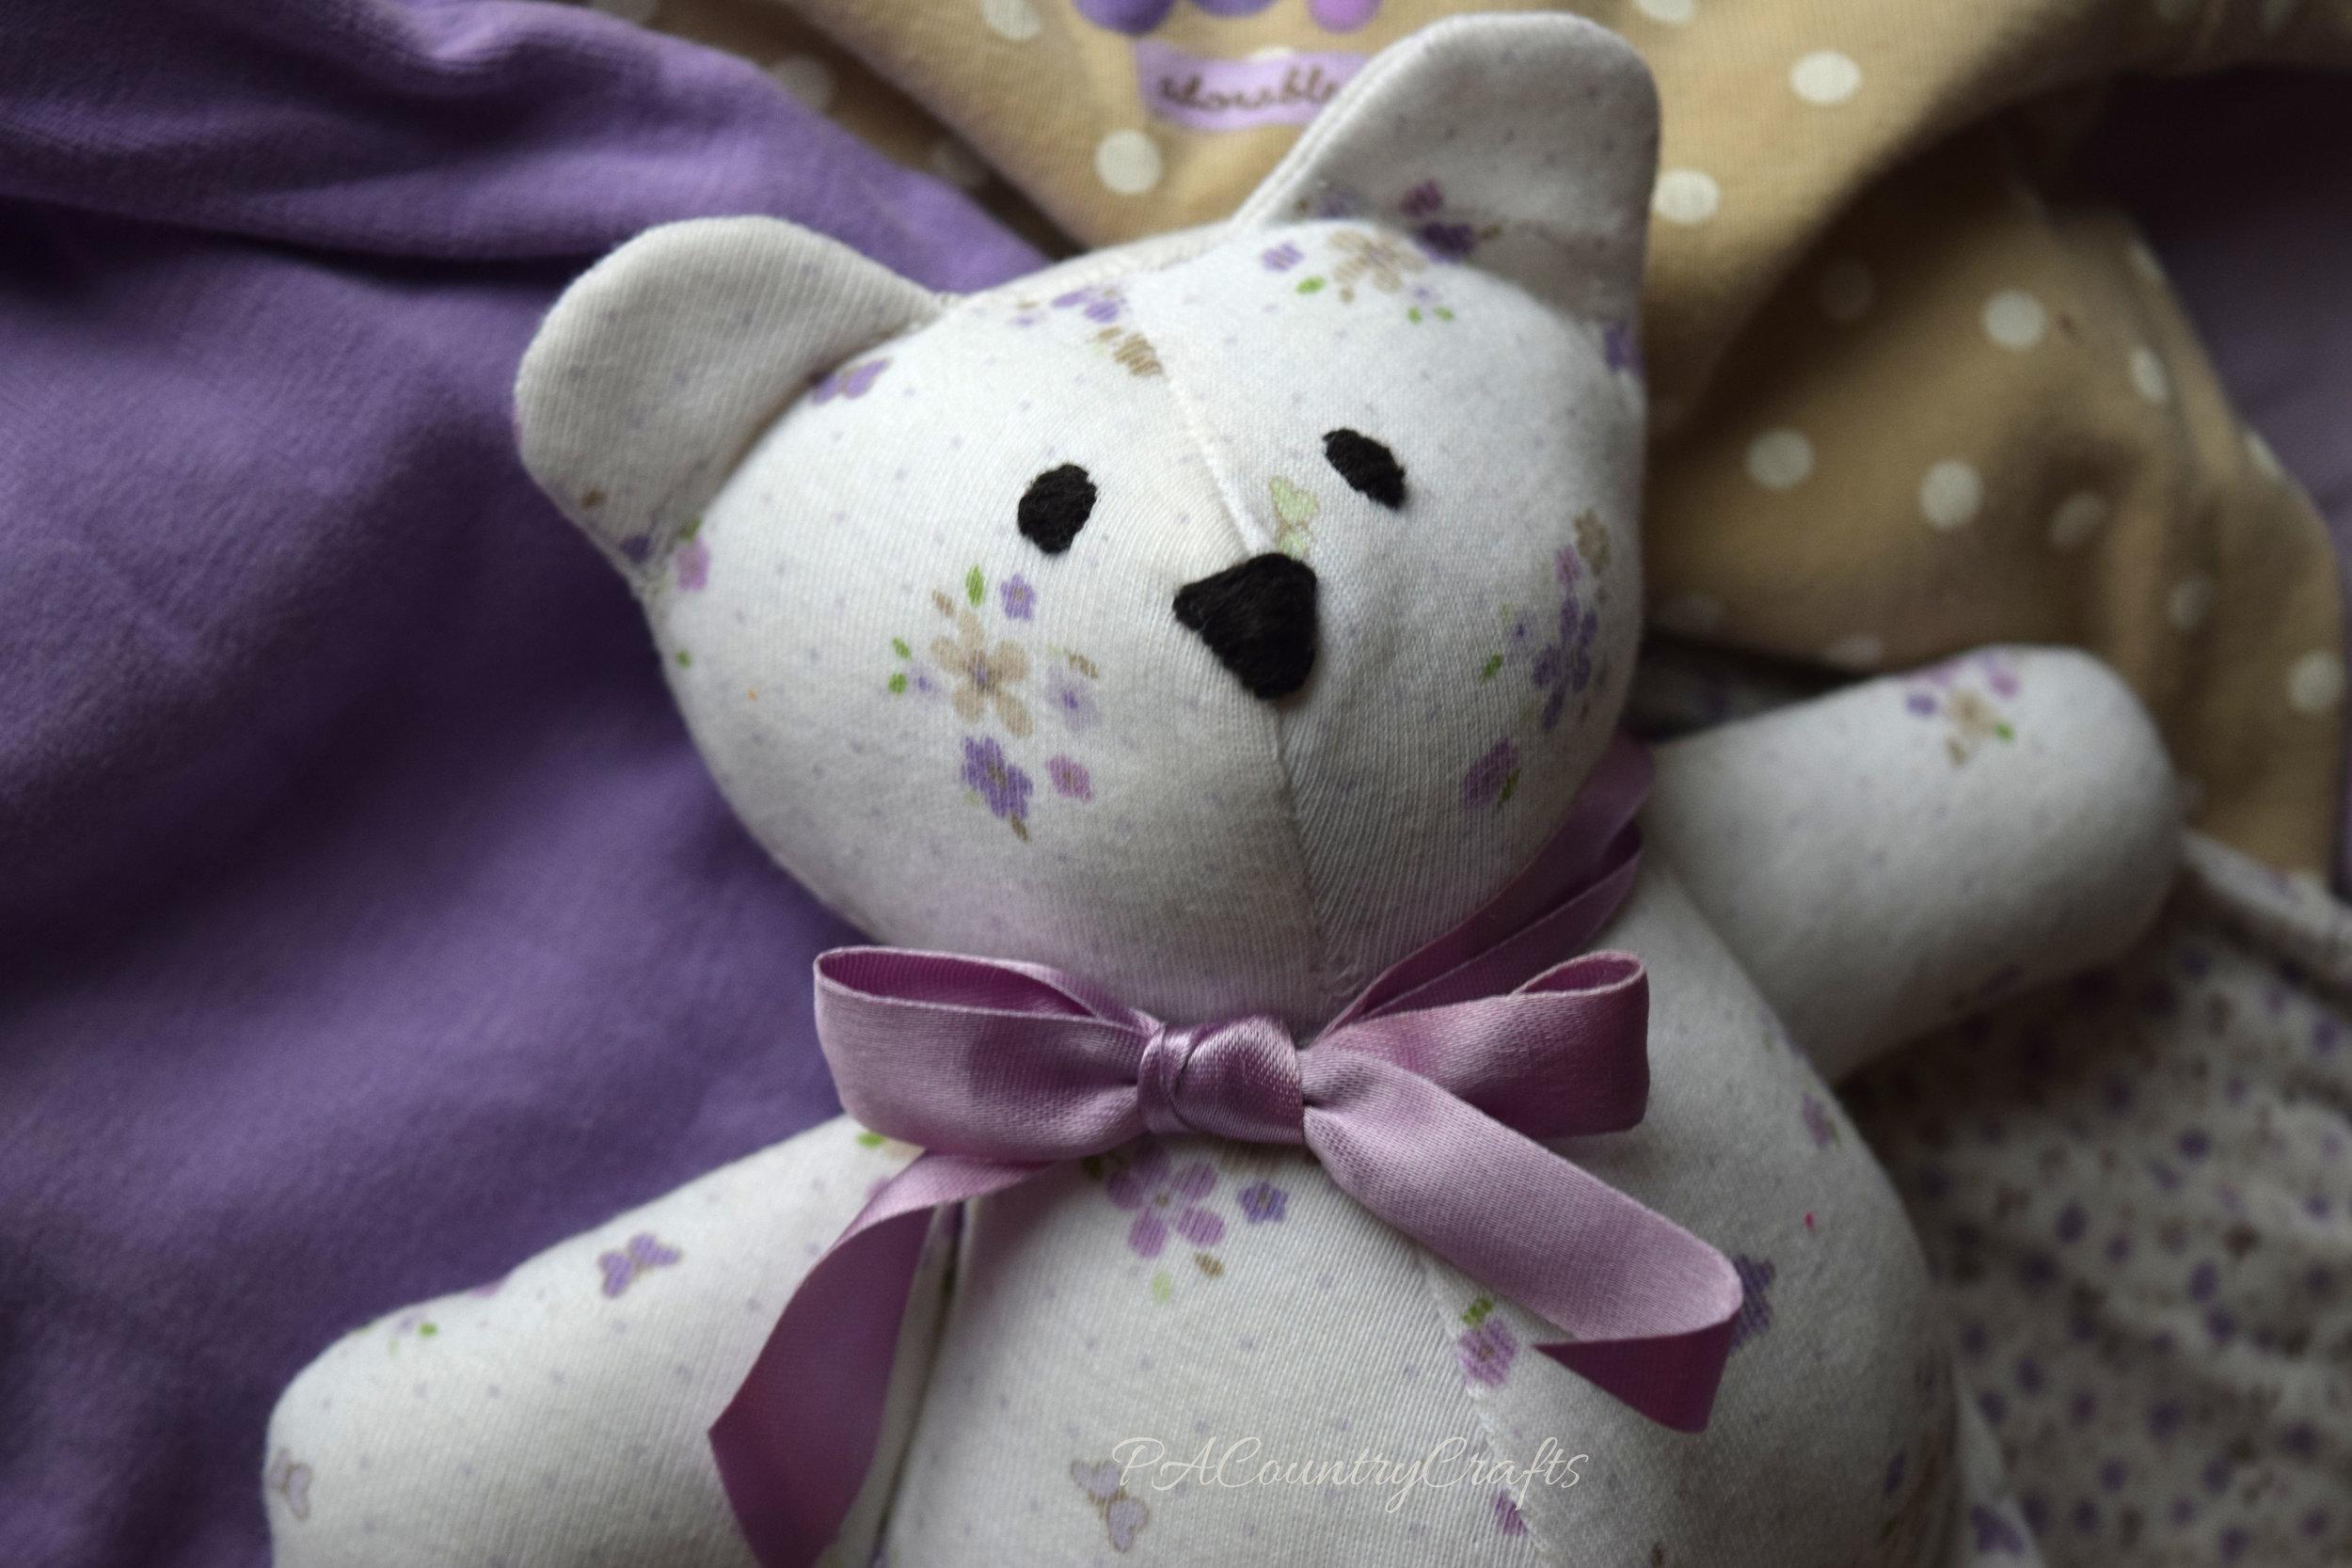 Make a cute stuffed bear from an old baby onesie.